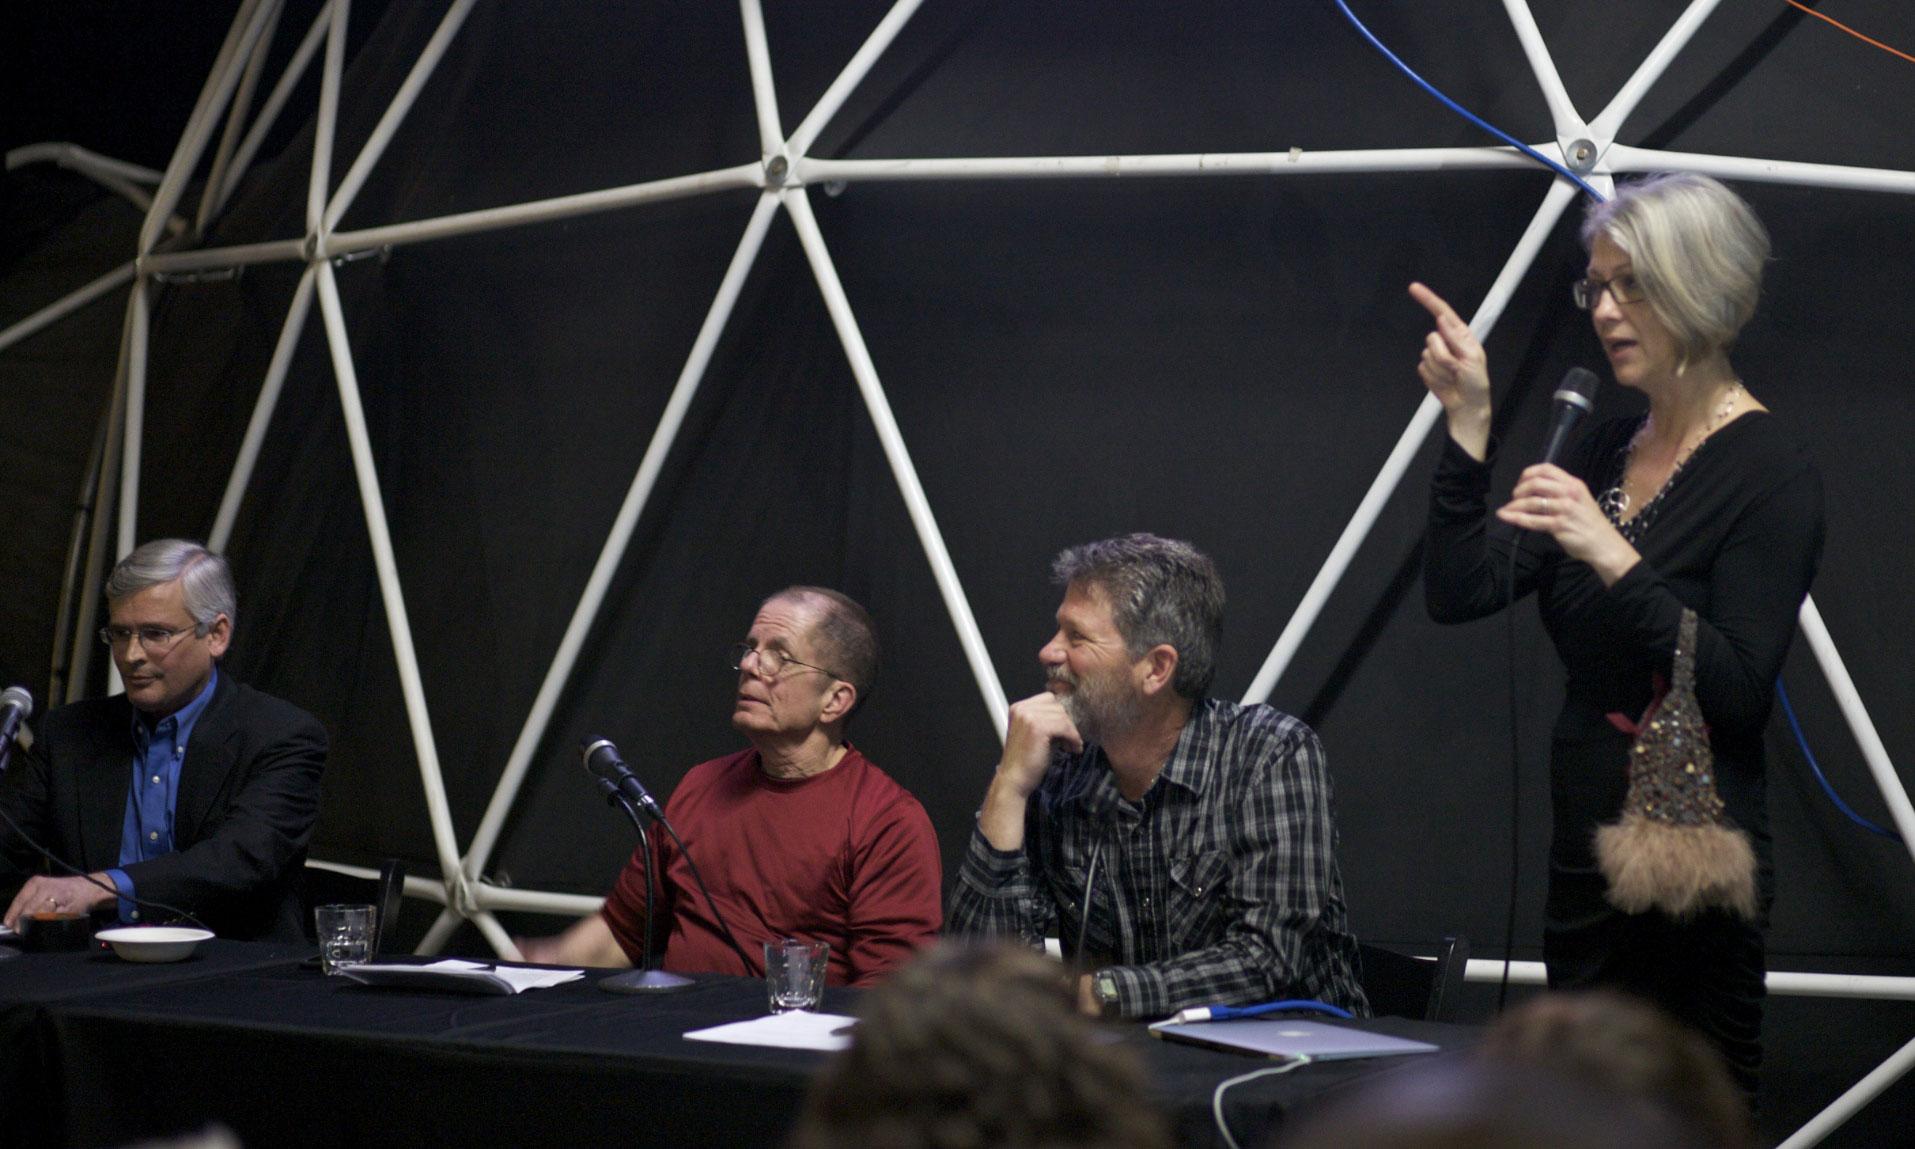 Grateful Dead panel discussion